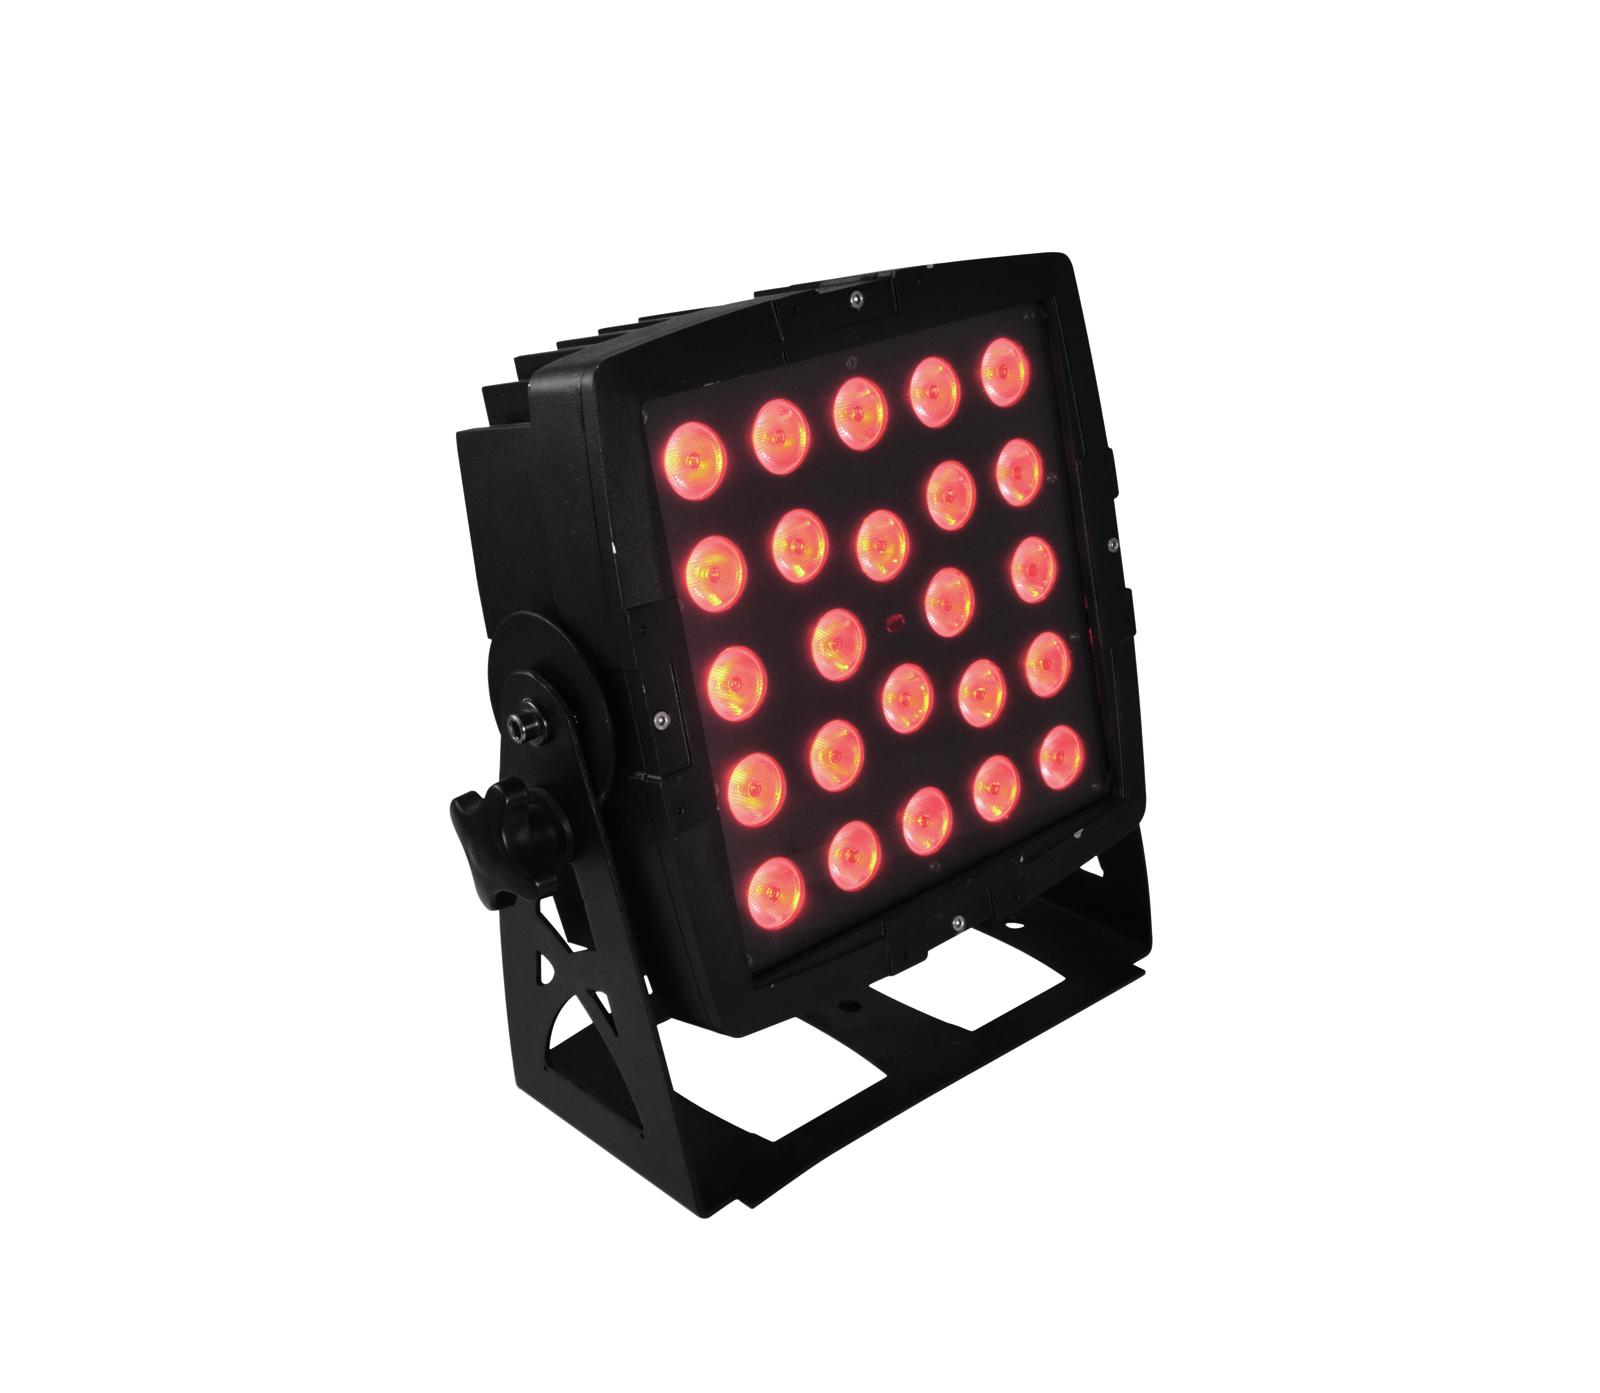 Eurolite LED reflektor 24x8W QCL IP65, DMX